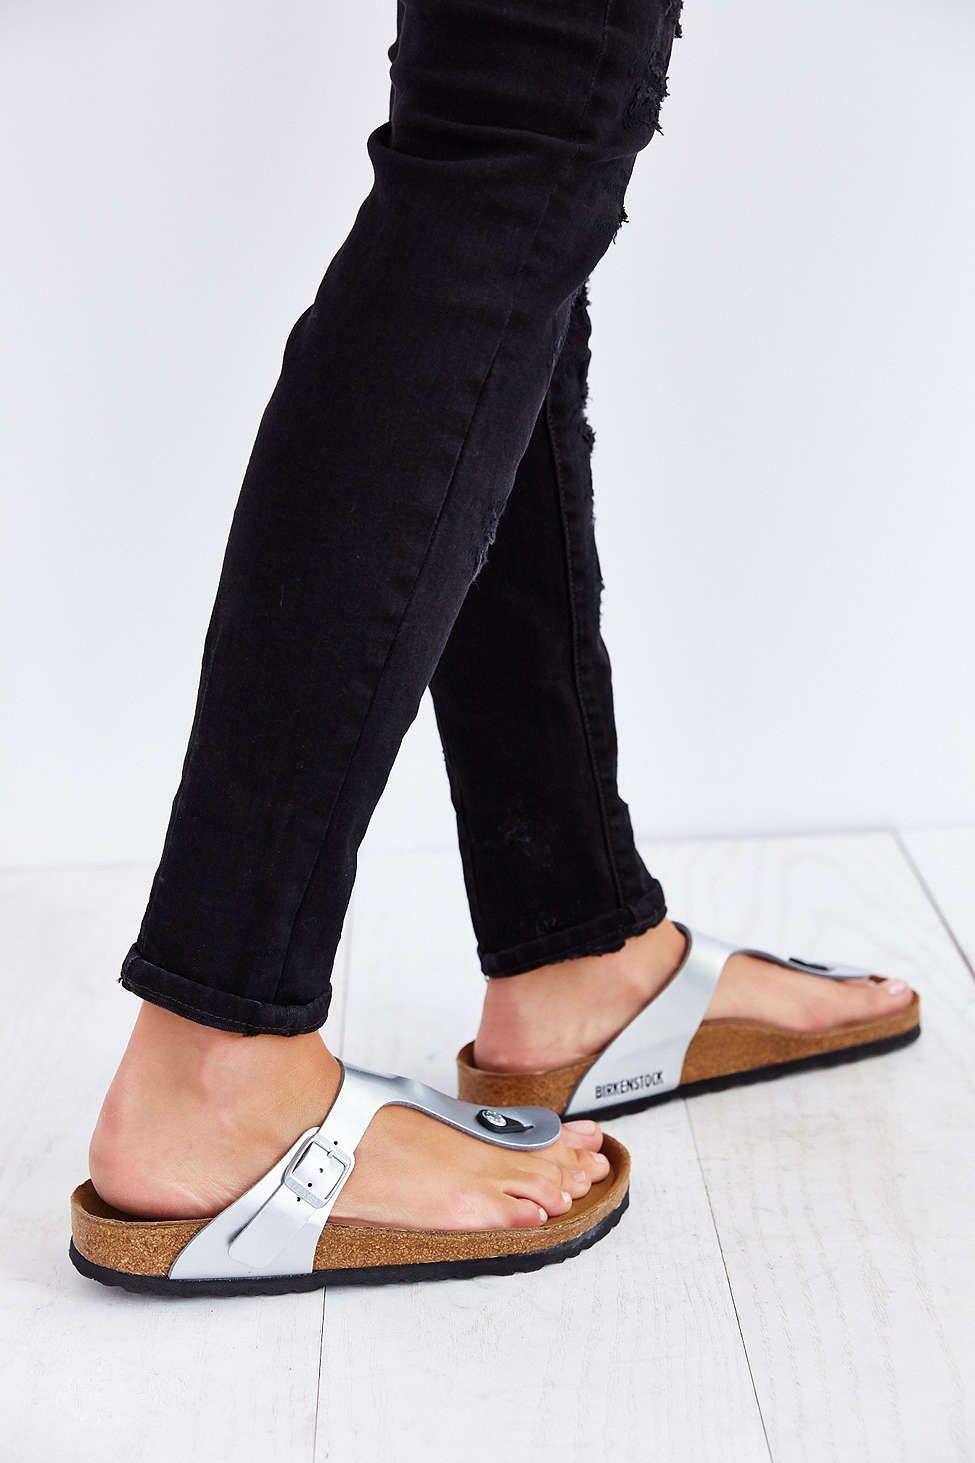 204e1e468c2 Birkenstock Gizeh Thong Sandal